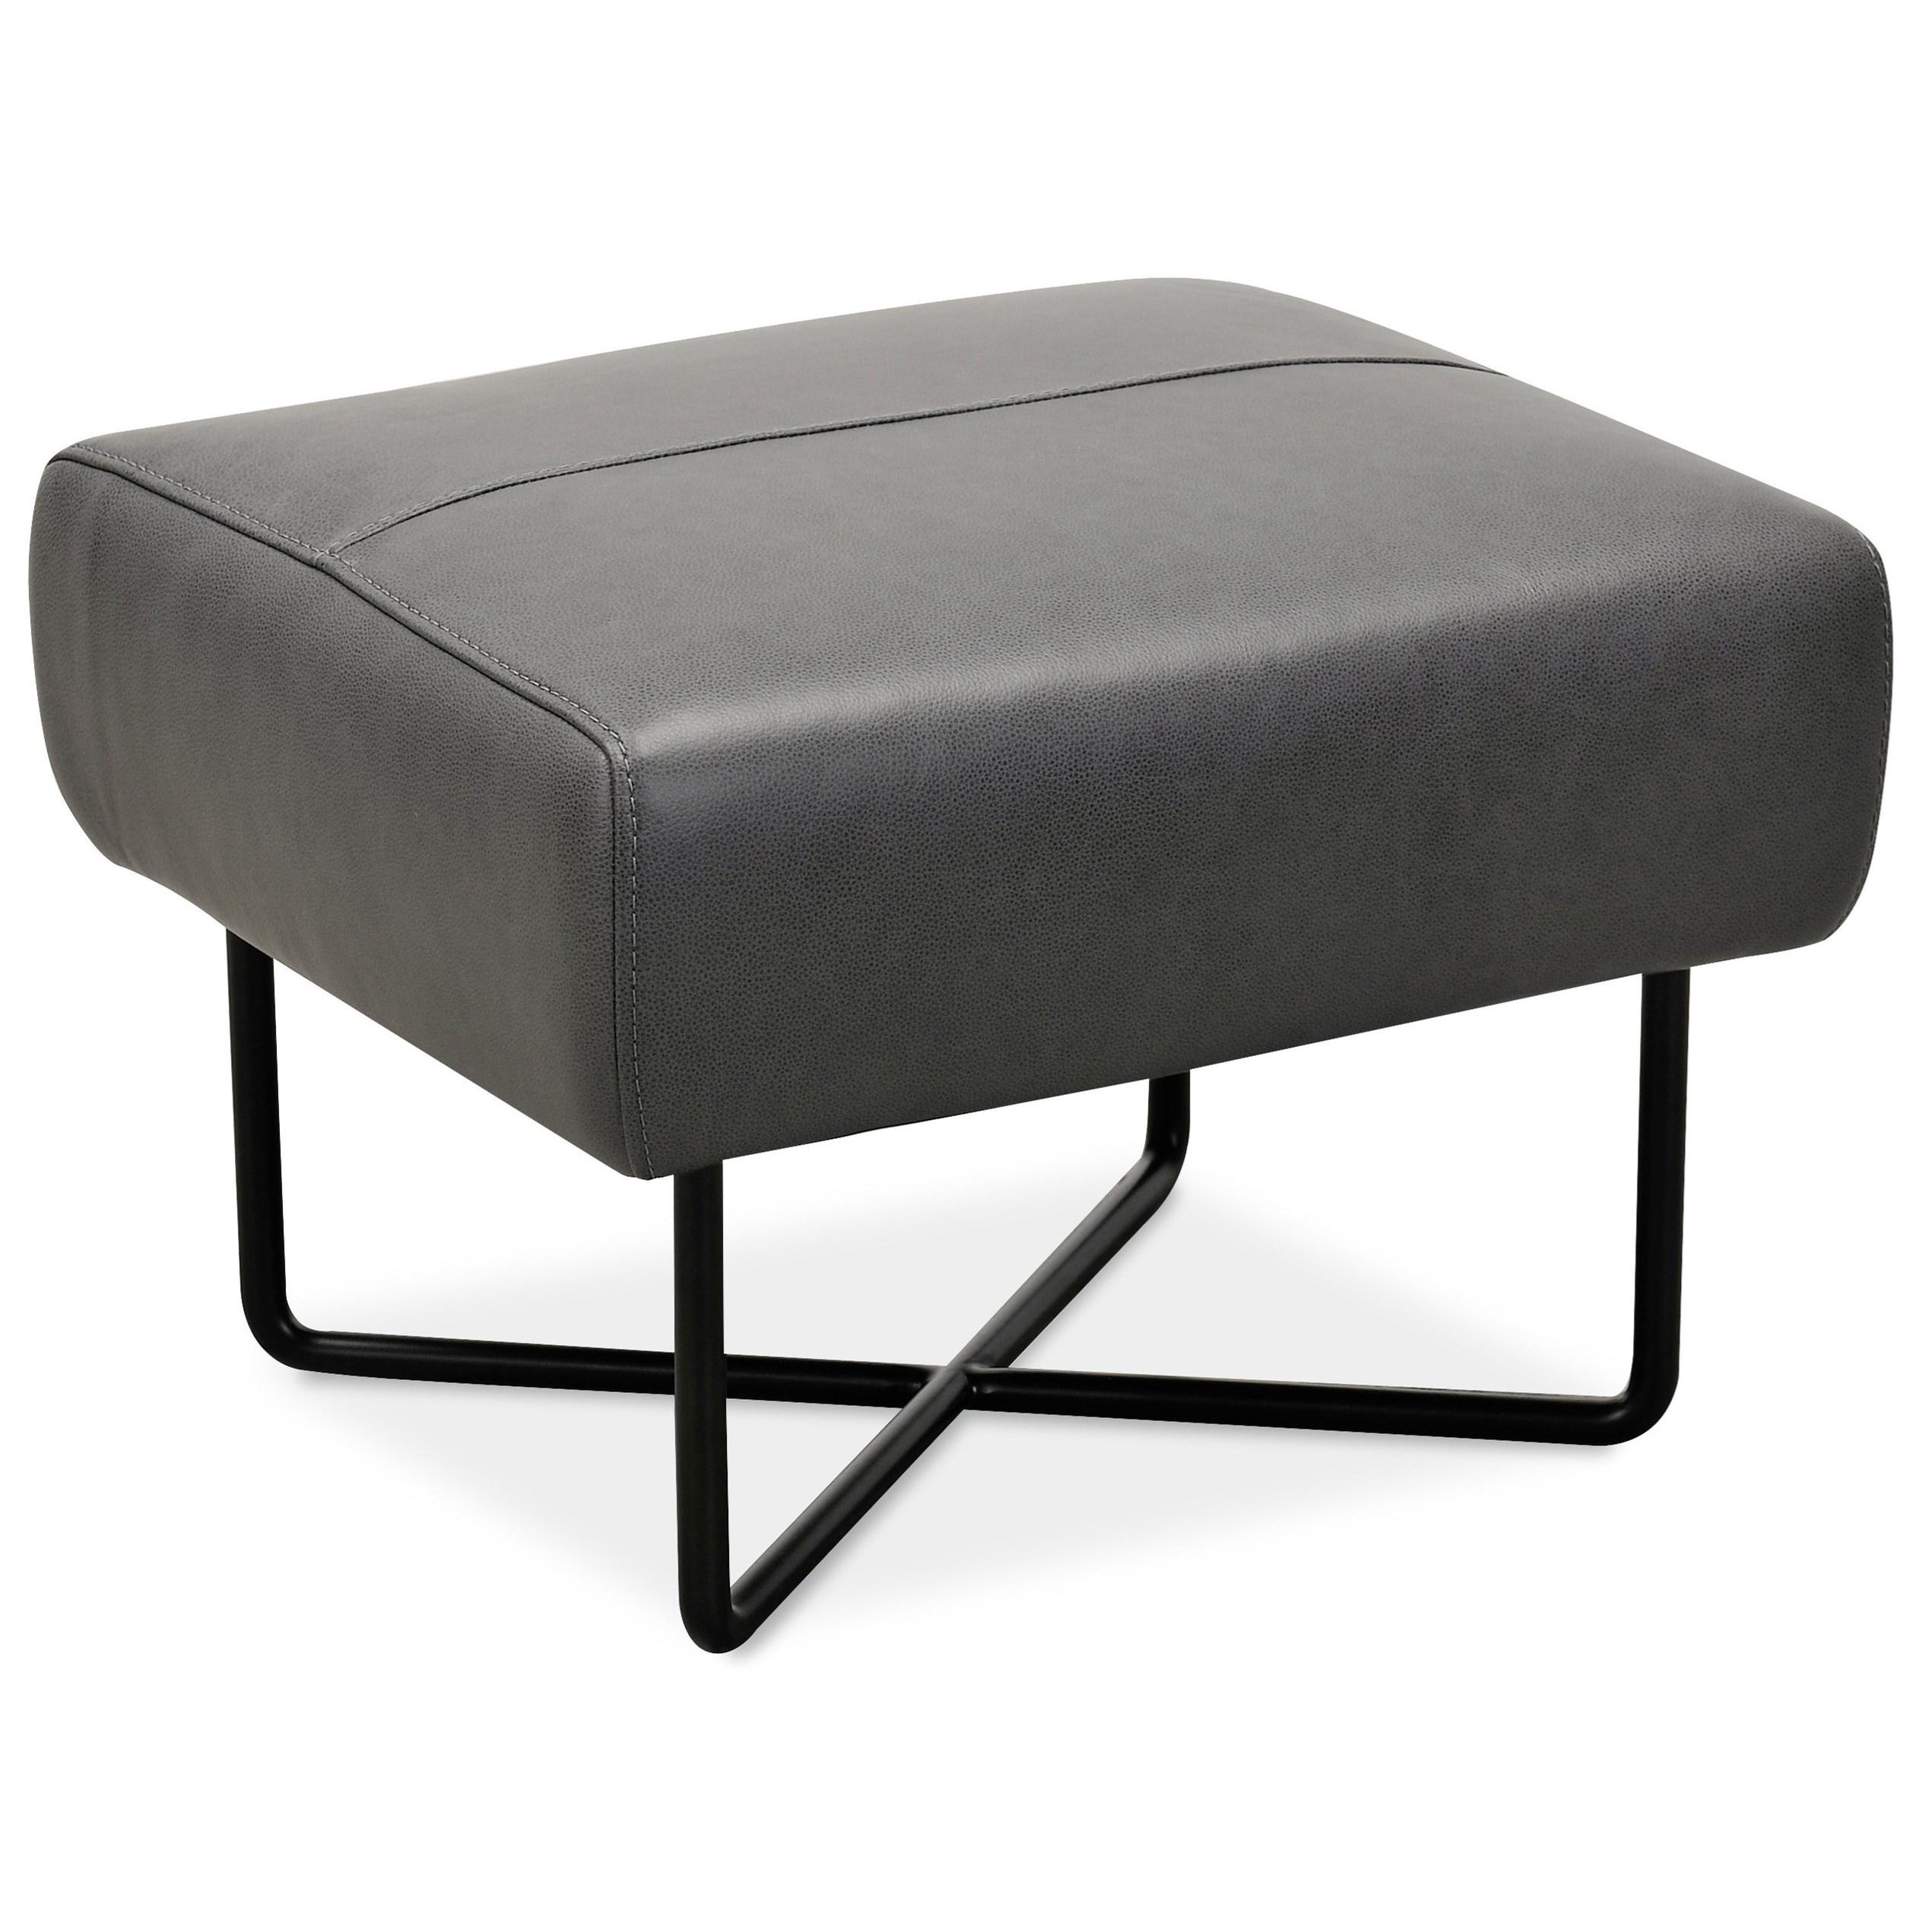 Efron Ottoman w/ Black Metal Base by Hooker Furniture at Baer's Furniture